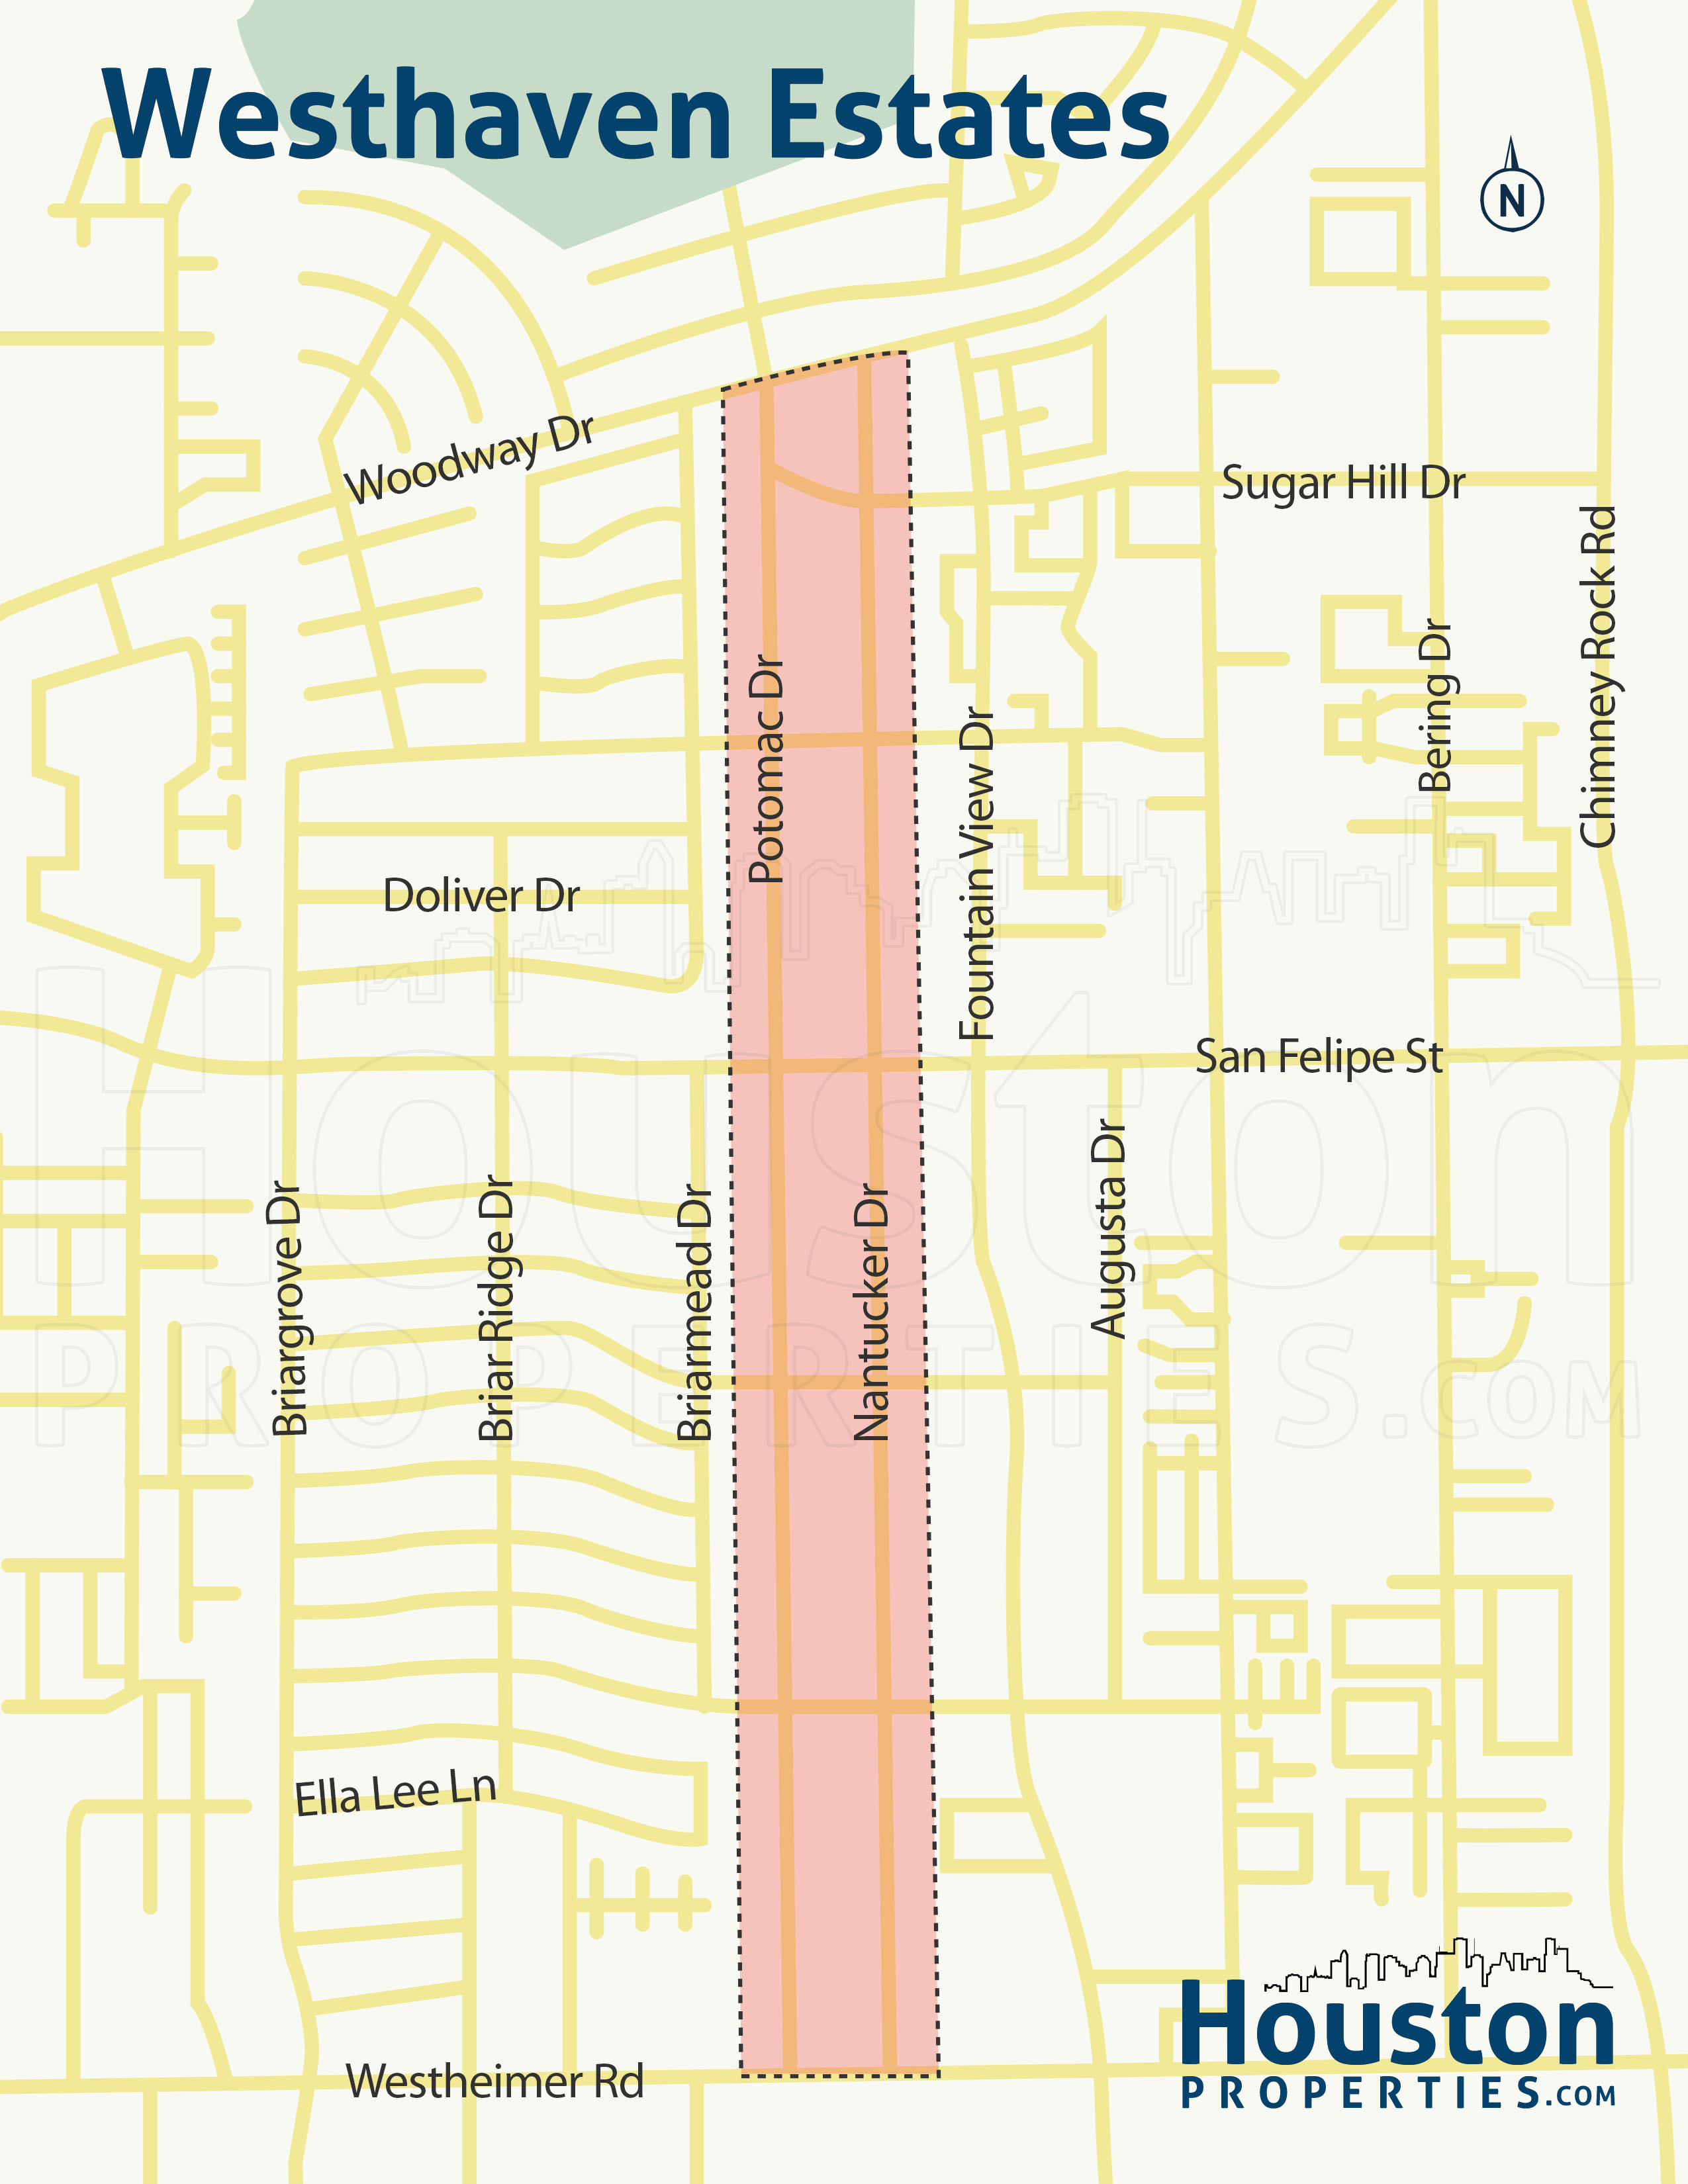 Westhaven Estates Houston Map